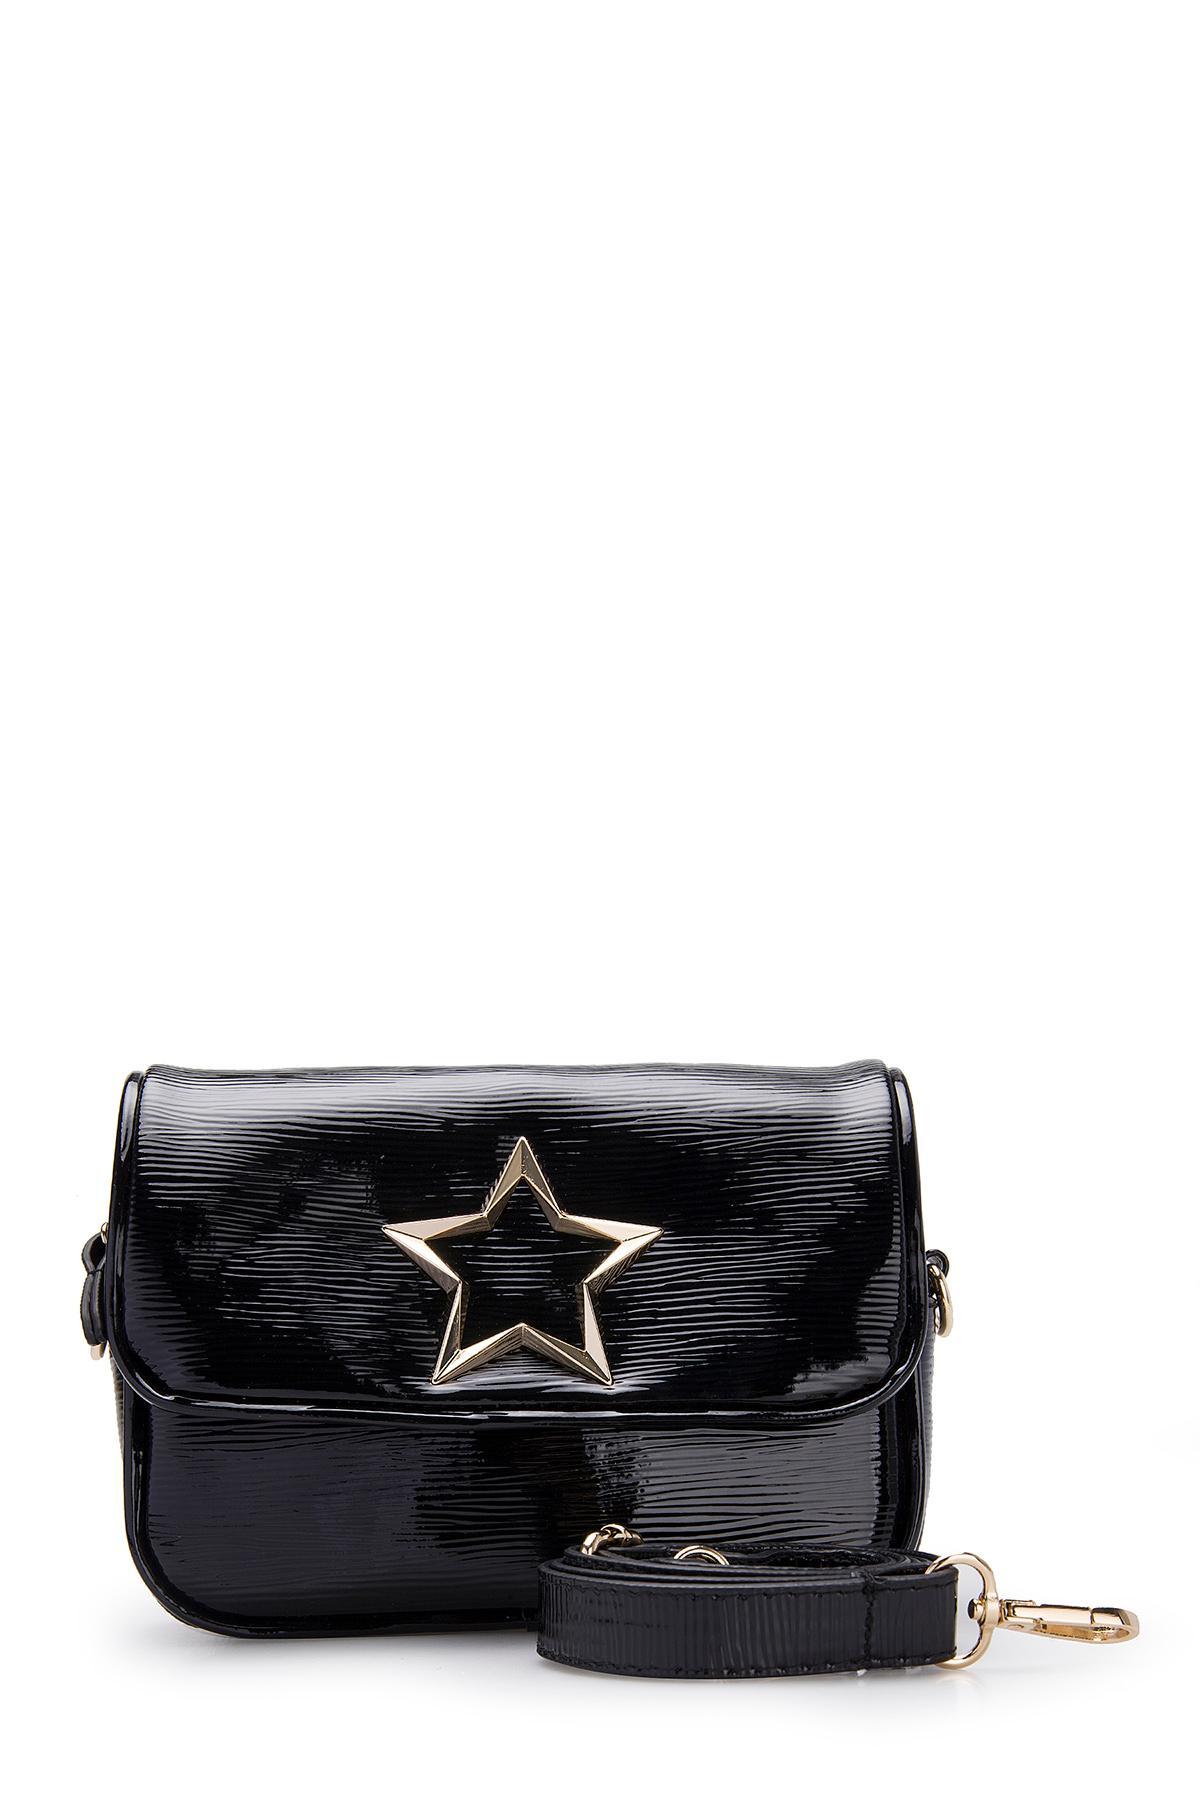 Desan Bag WOMEN BAG 479Y4770